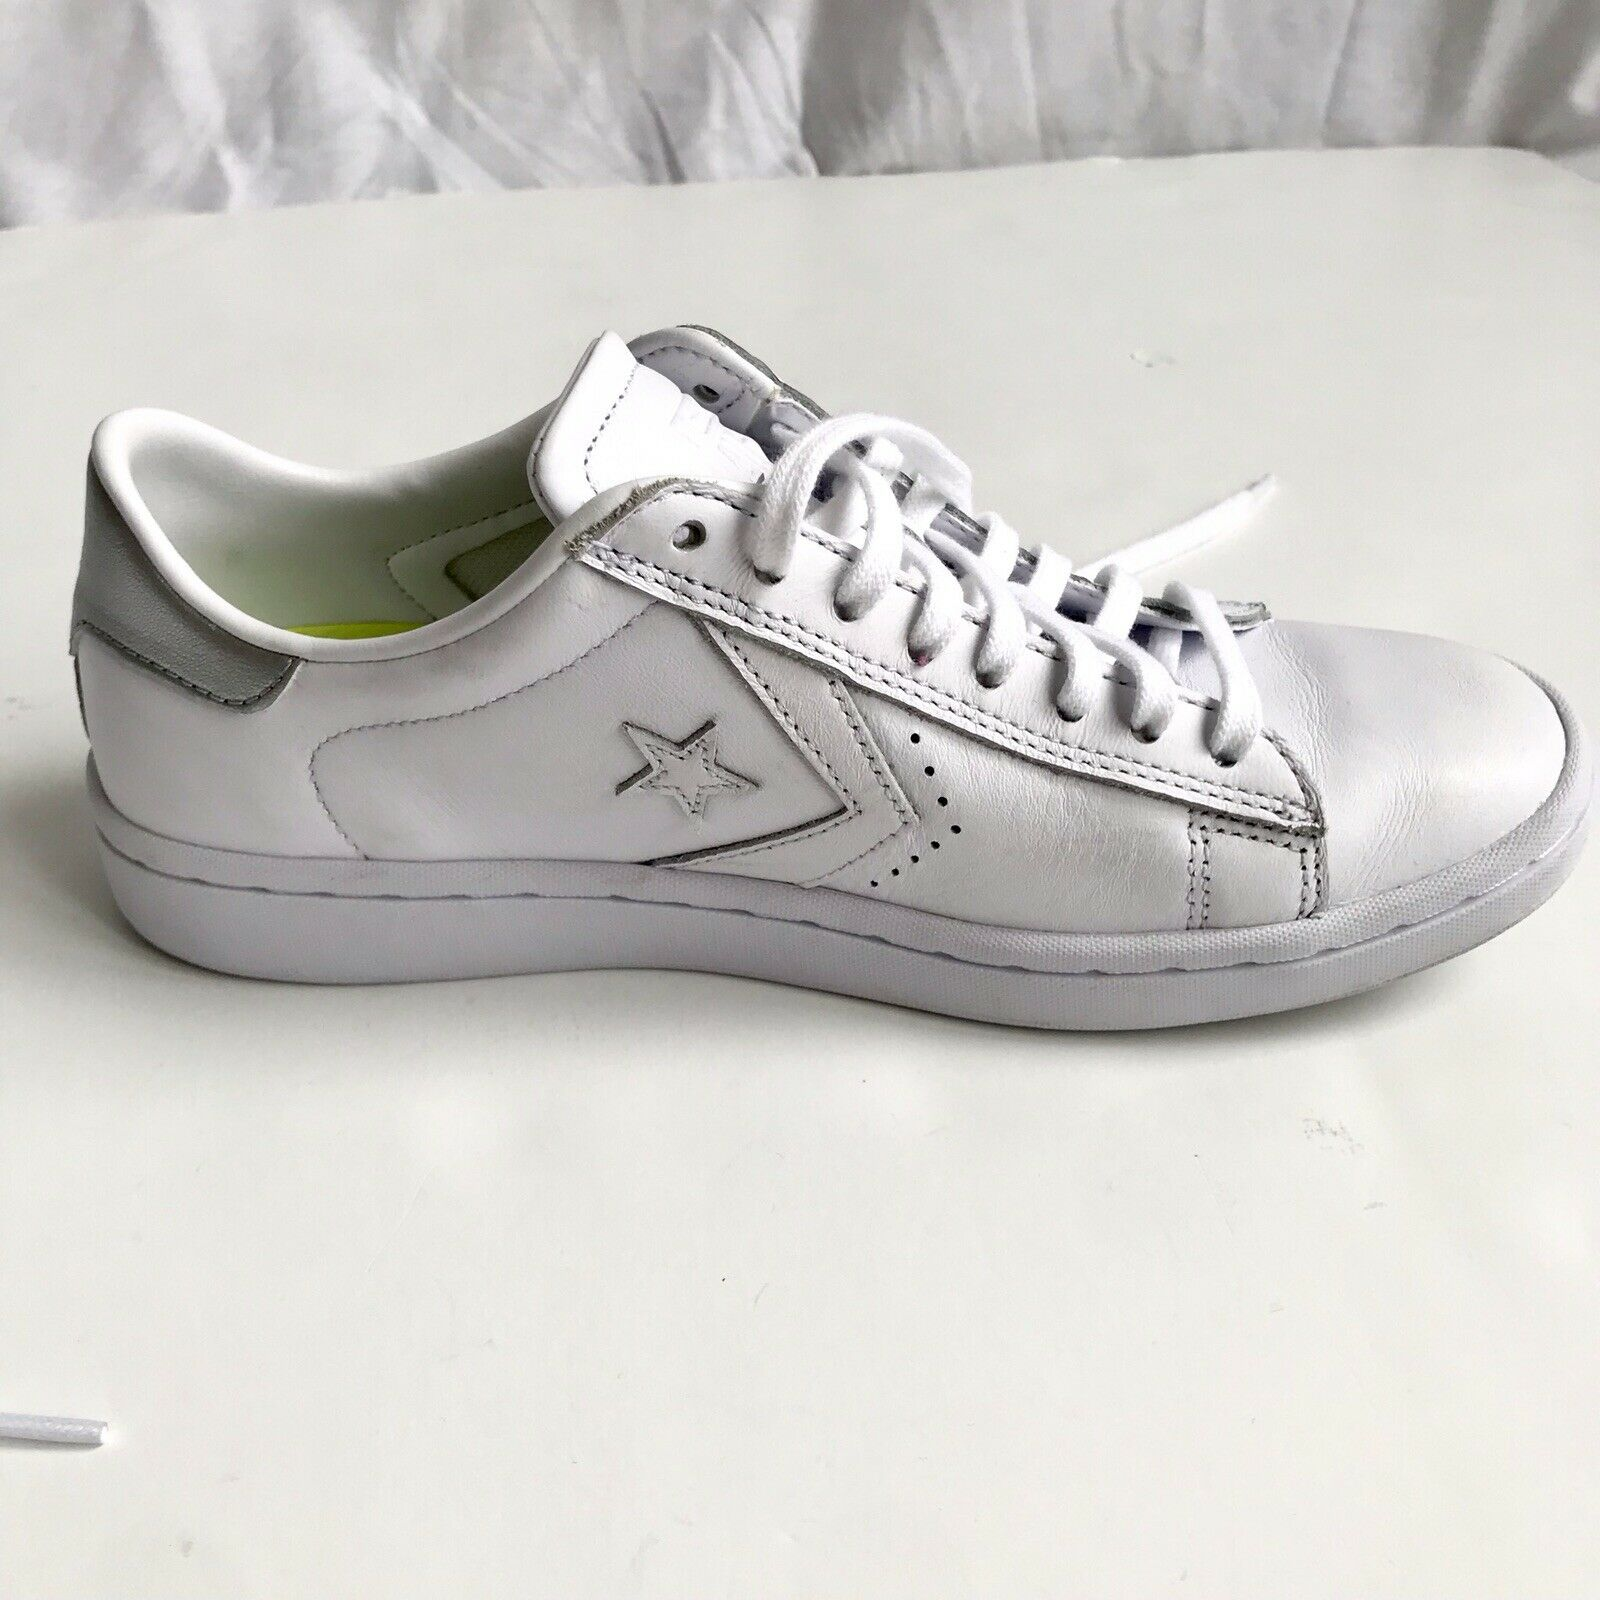 Converse donna's Pro Leather Lp Ox bianca Leo Rise scarpe Dimensione donna Dimensione 7